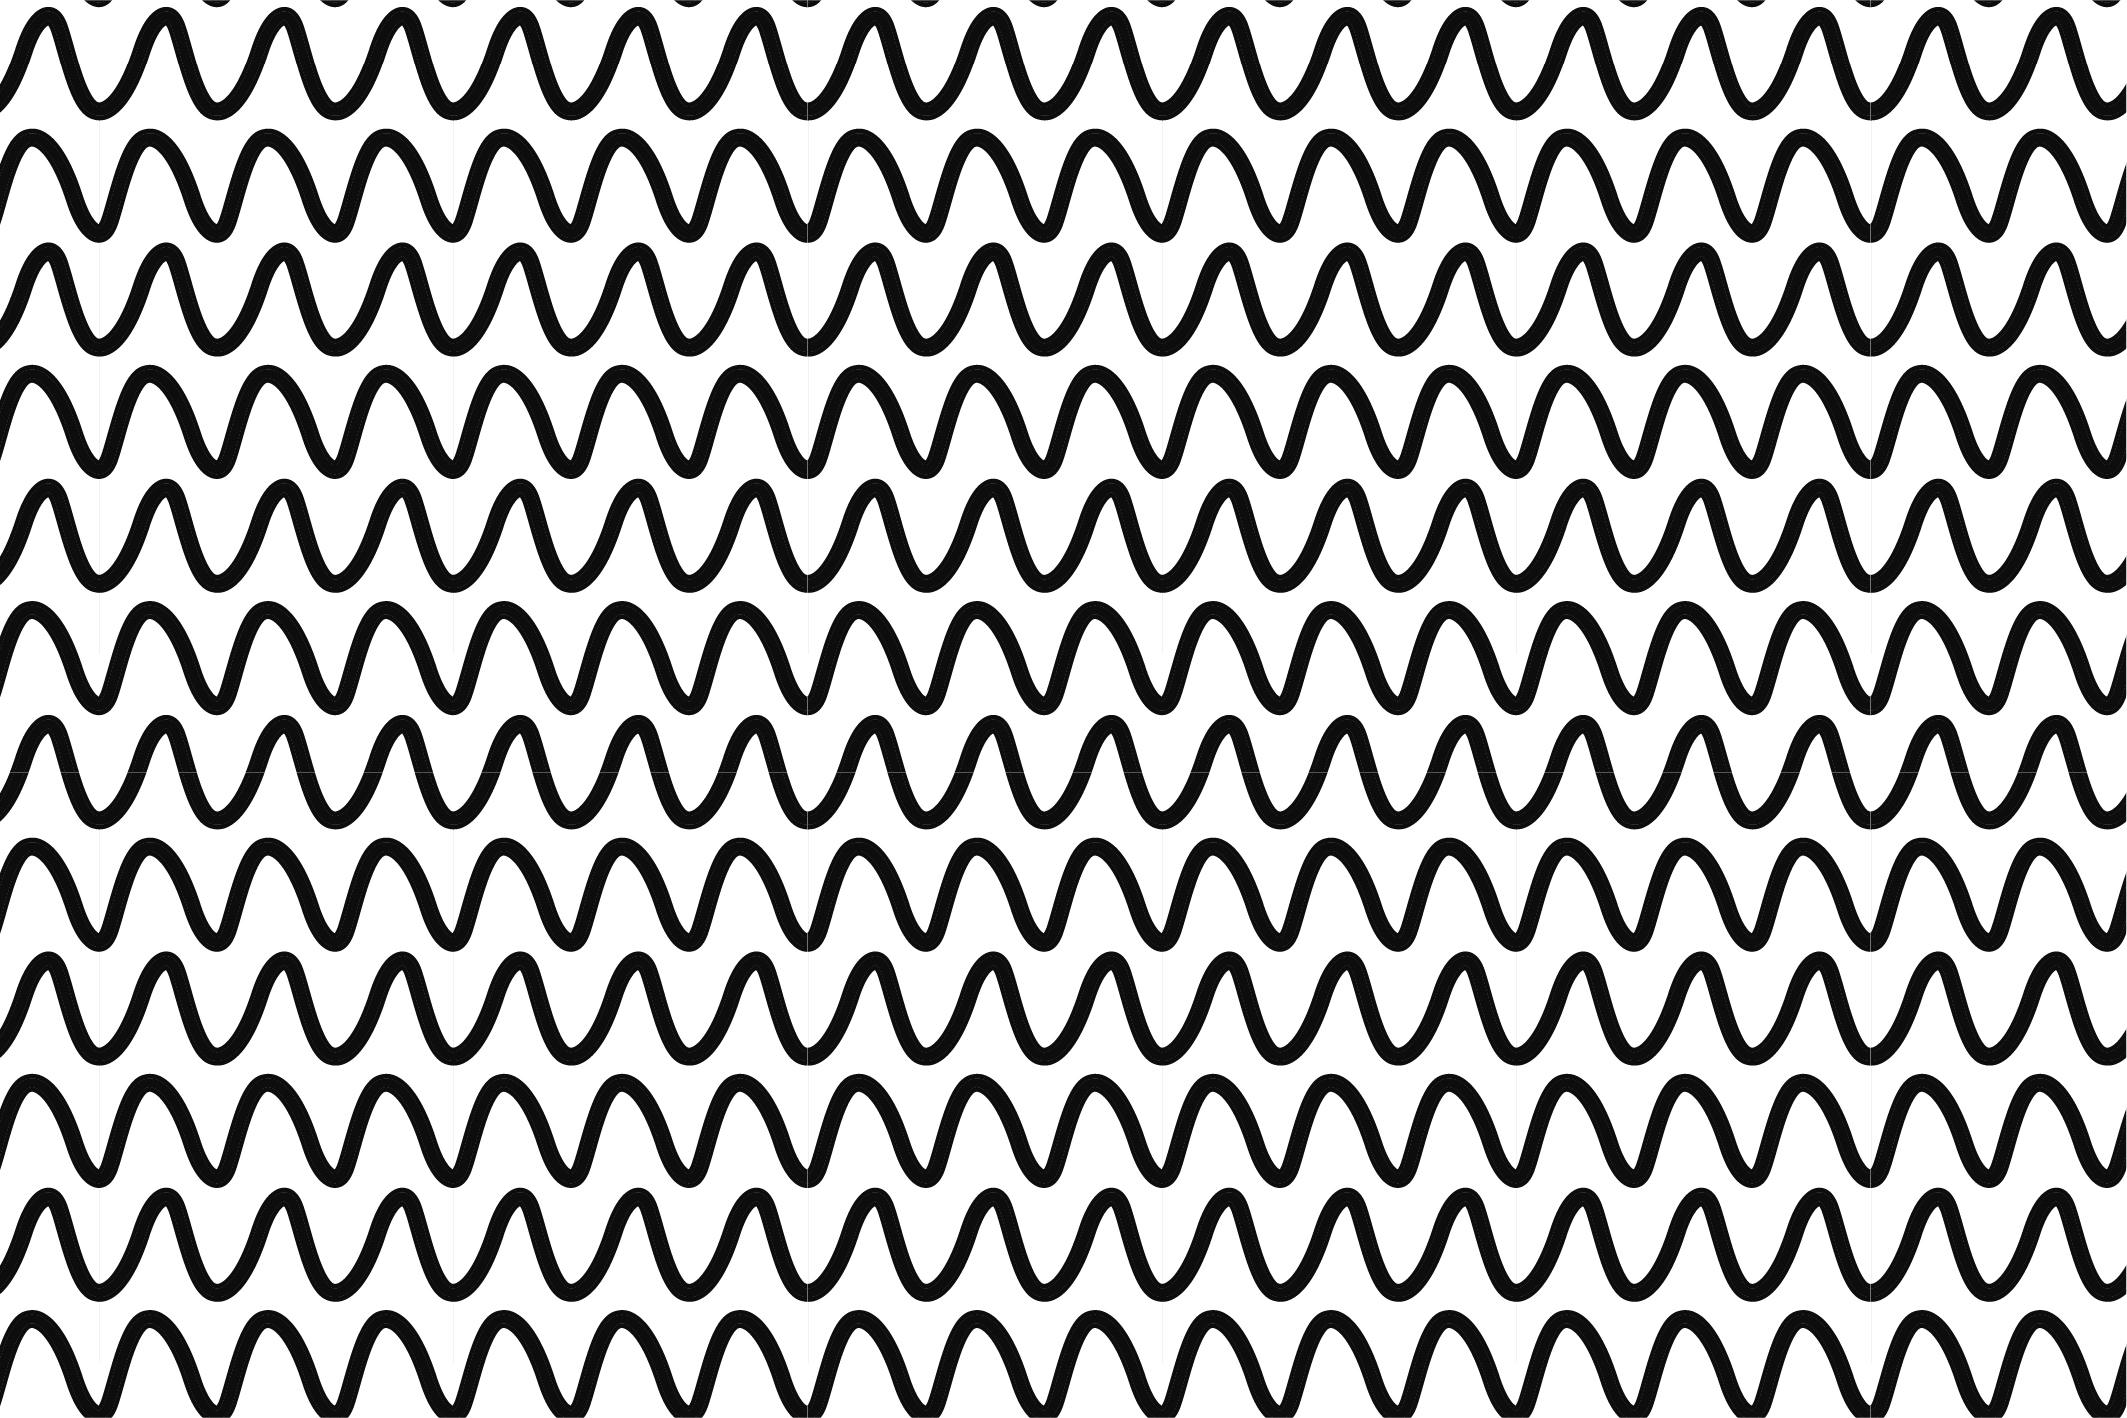 Wave&Zigzag seamless patterns. B&W. example image 3